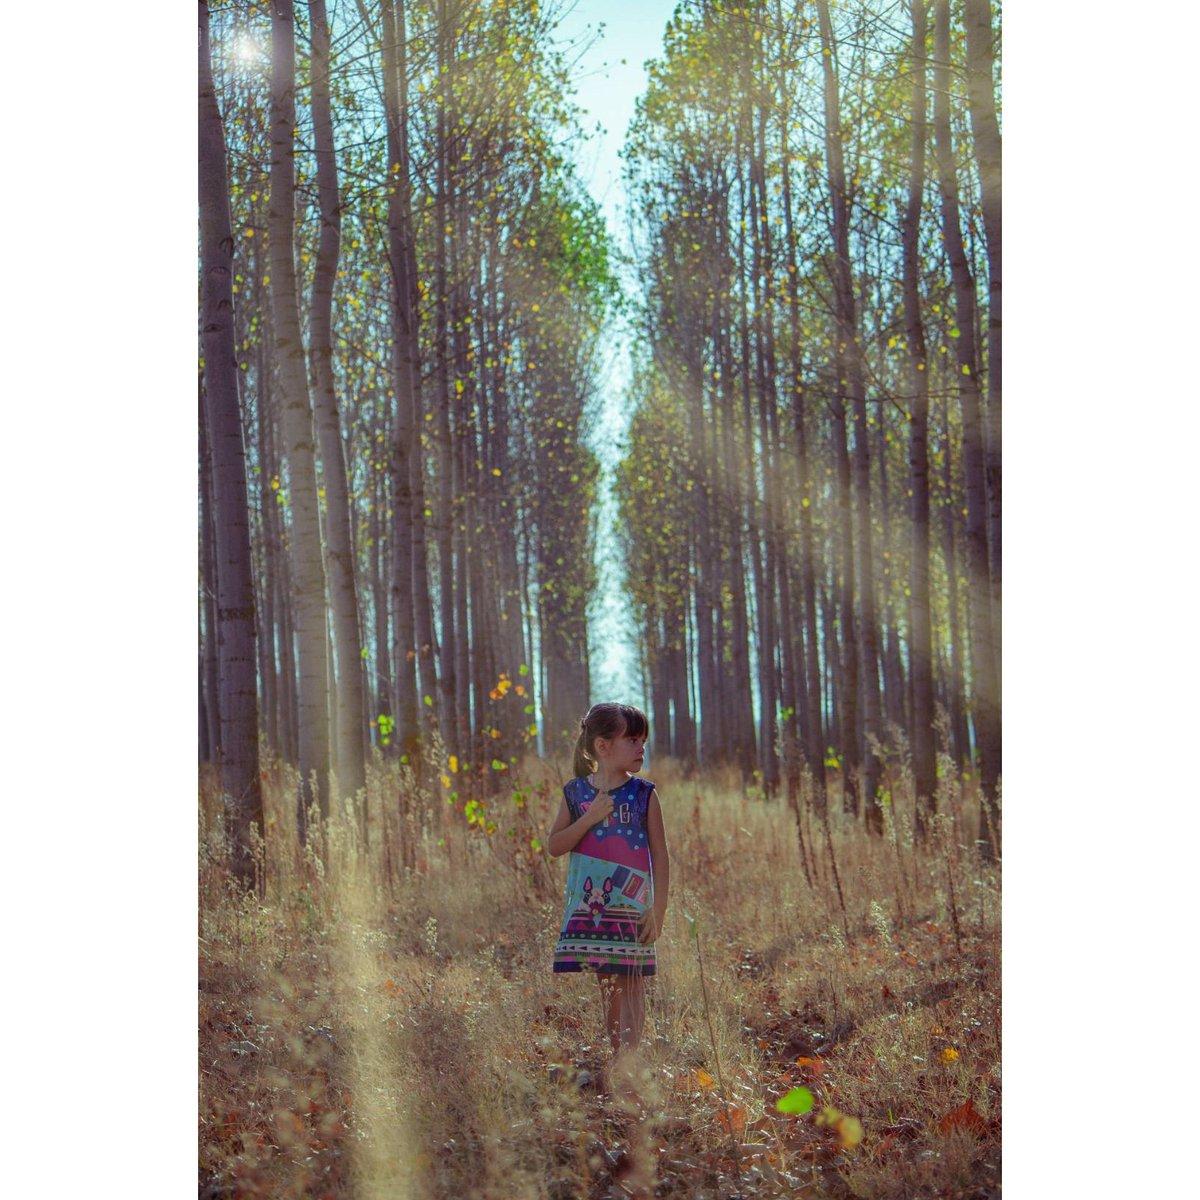 Los caminos son oscuros y peligrosos, pero si buscas siempre habrá una luz que guiará tu destino.  #light #forest #lifestyle #life #lifequotes #best #total_kids #sun #sunset #bestoftheday #kids #model #kidsmodel #igers #instakids #instagram #princess